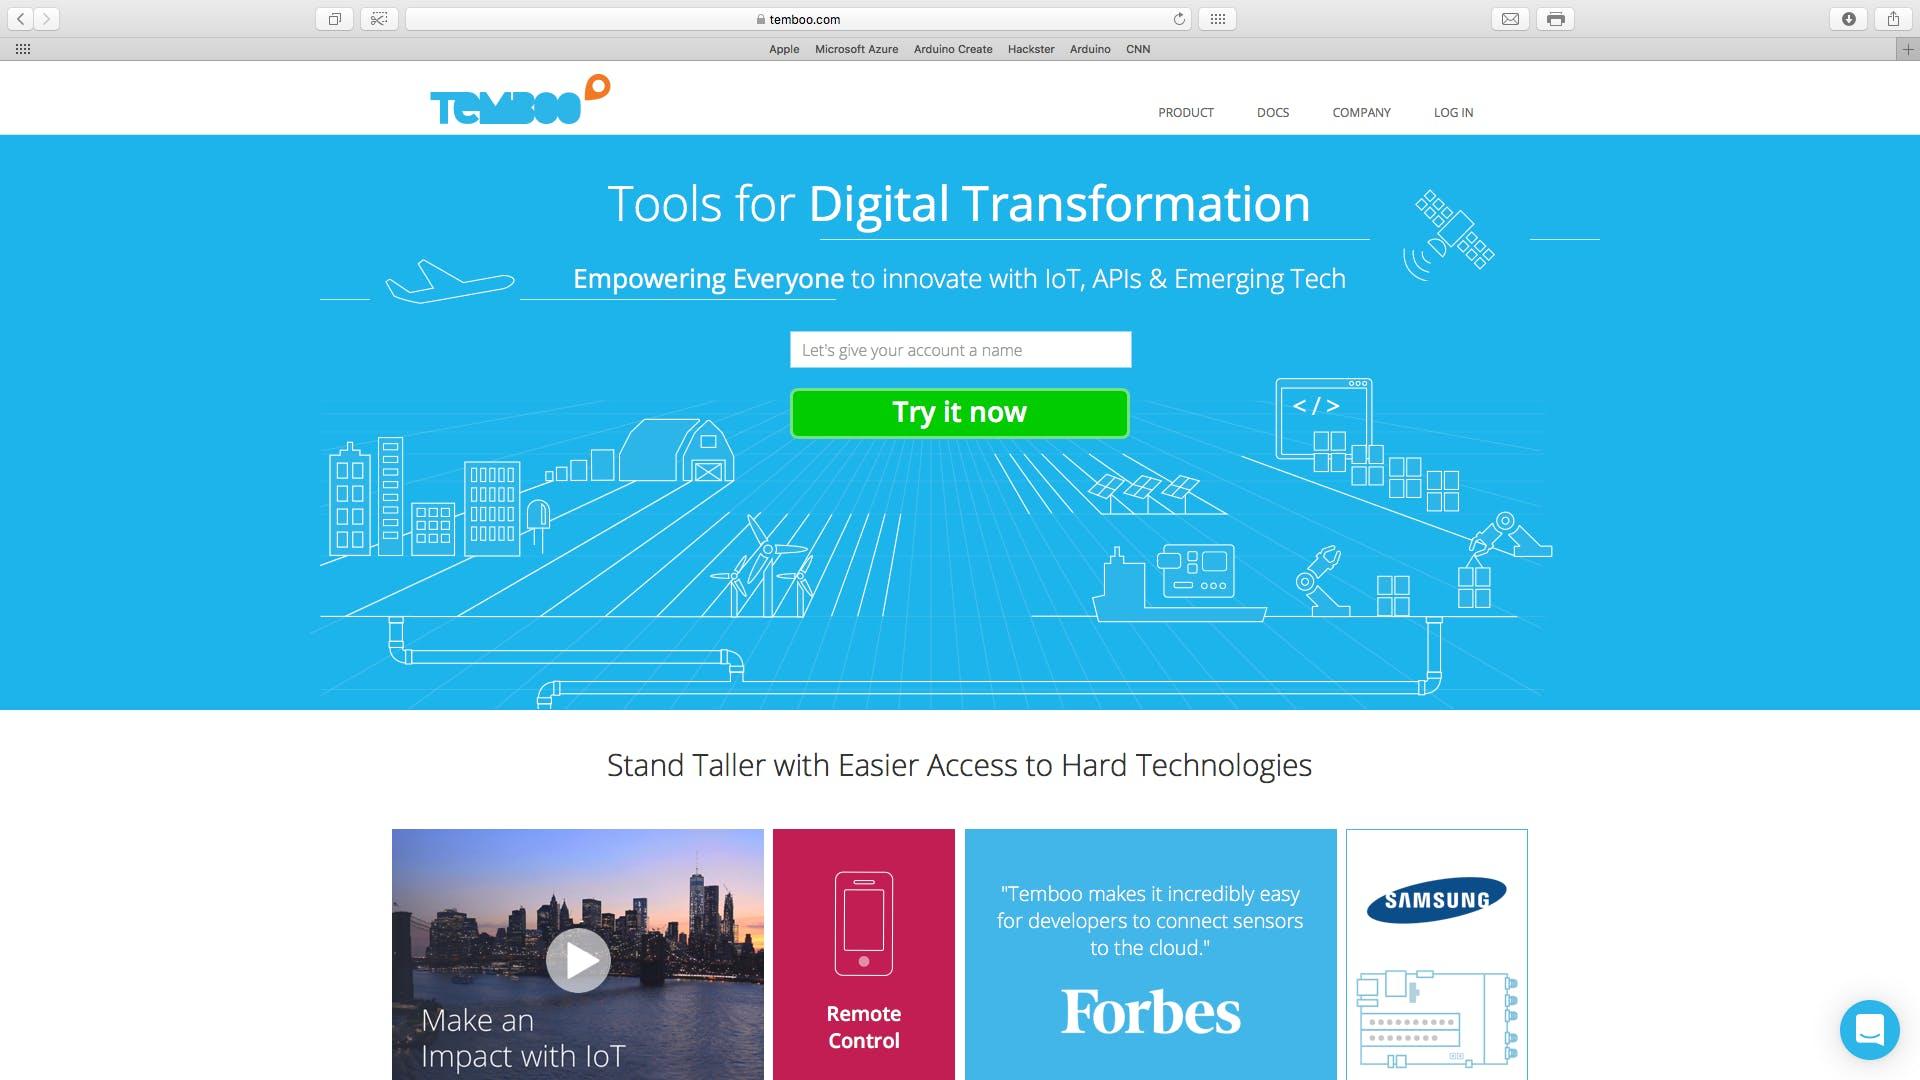 Open temboo.com